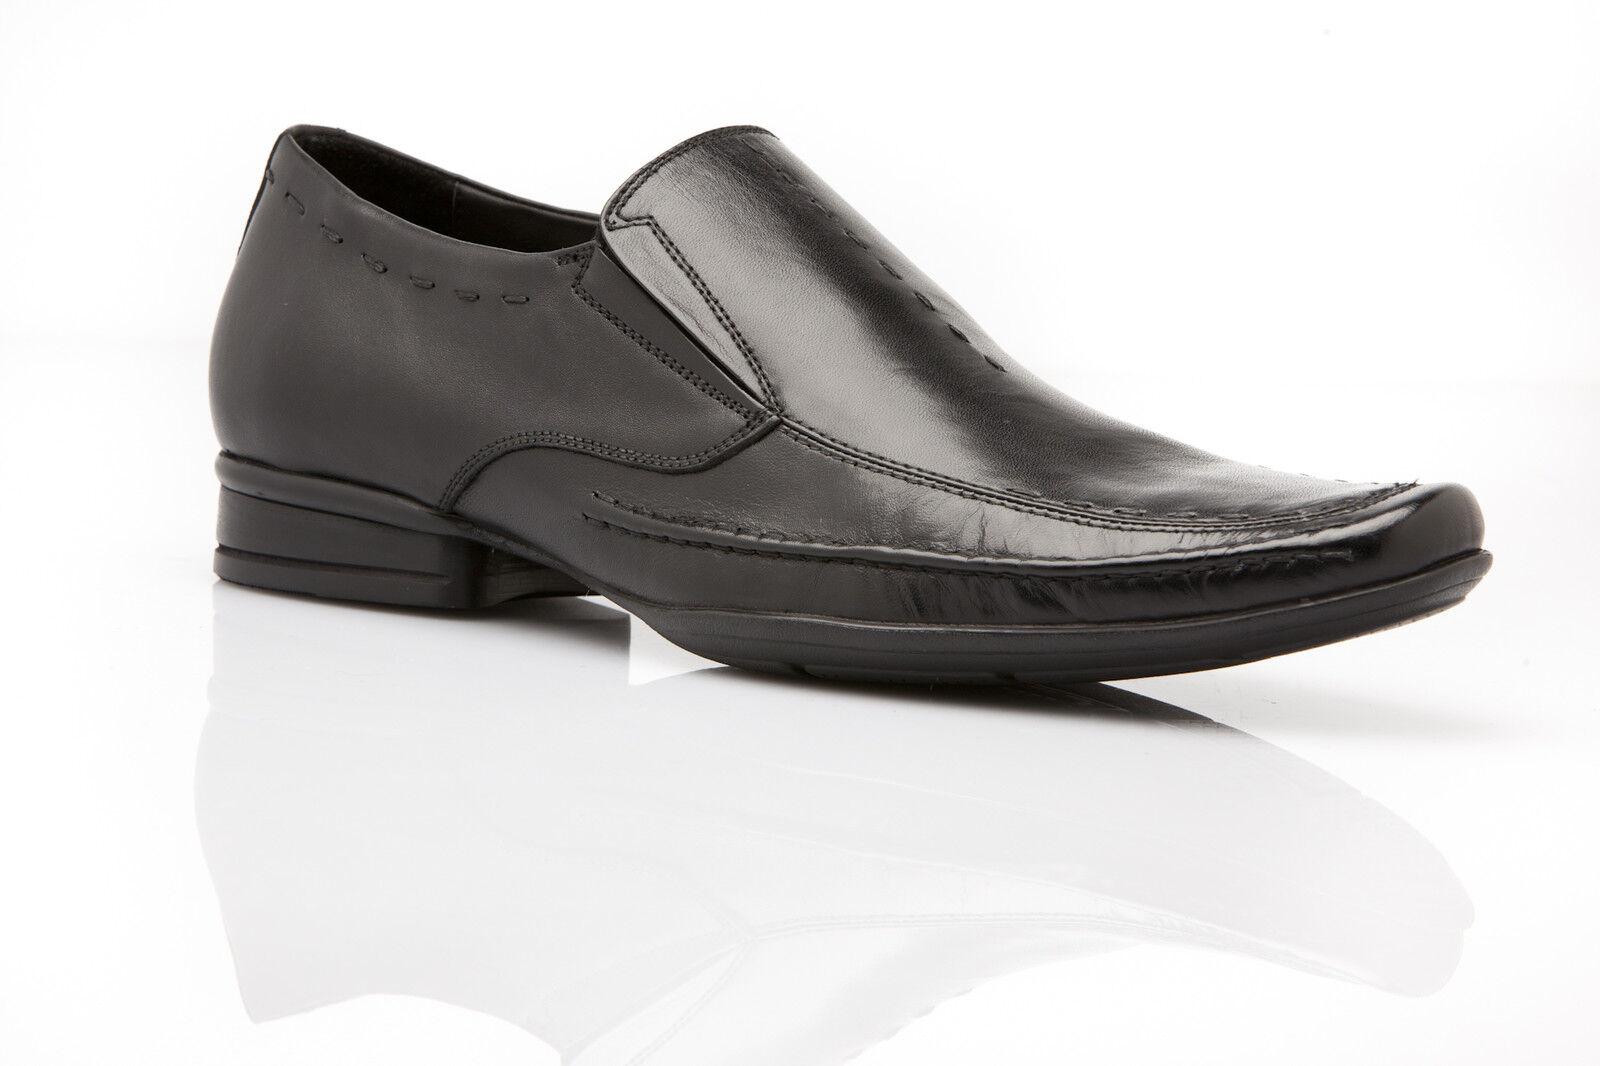 NEW MENS AUSTRALIAN DESIGN ZASEL DRESS schwarz LEATHER LOAFERS DRESS FORMAL schuhe